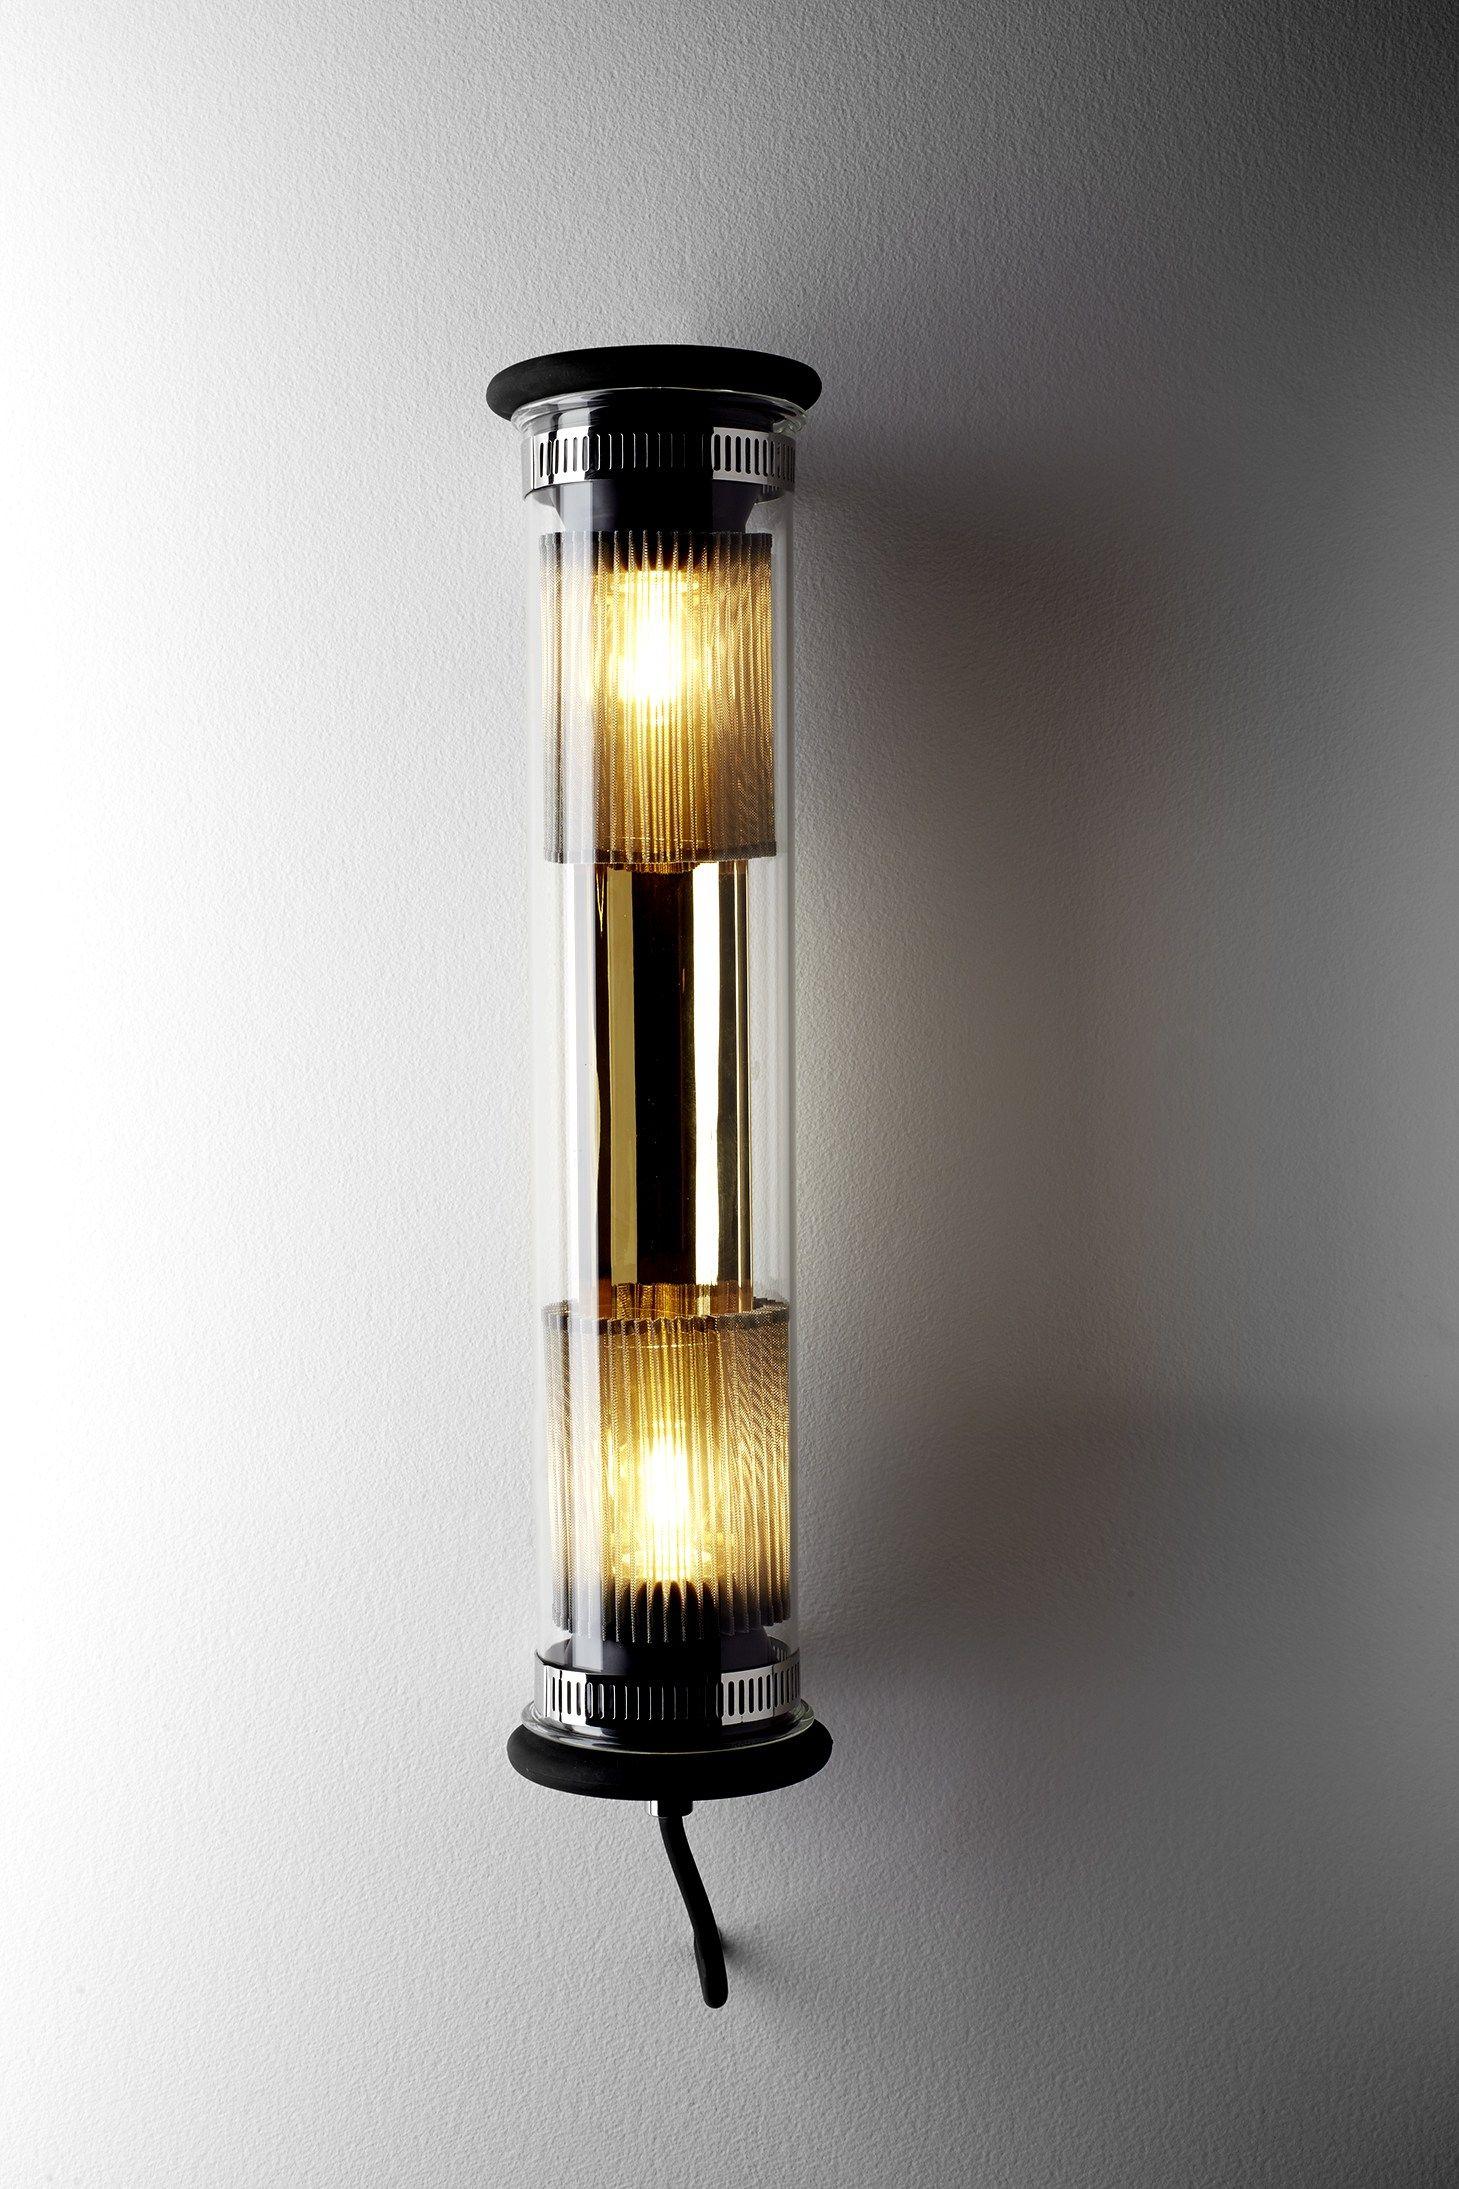 Suspension applique en verre borosilicate in the tube 100 500 by dcw ditions design dominique - Dcw edities ...